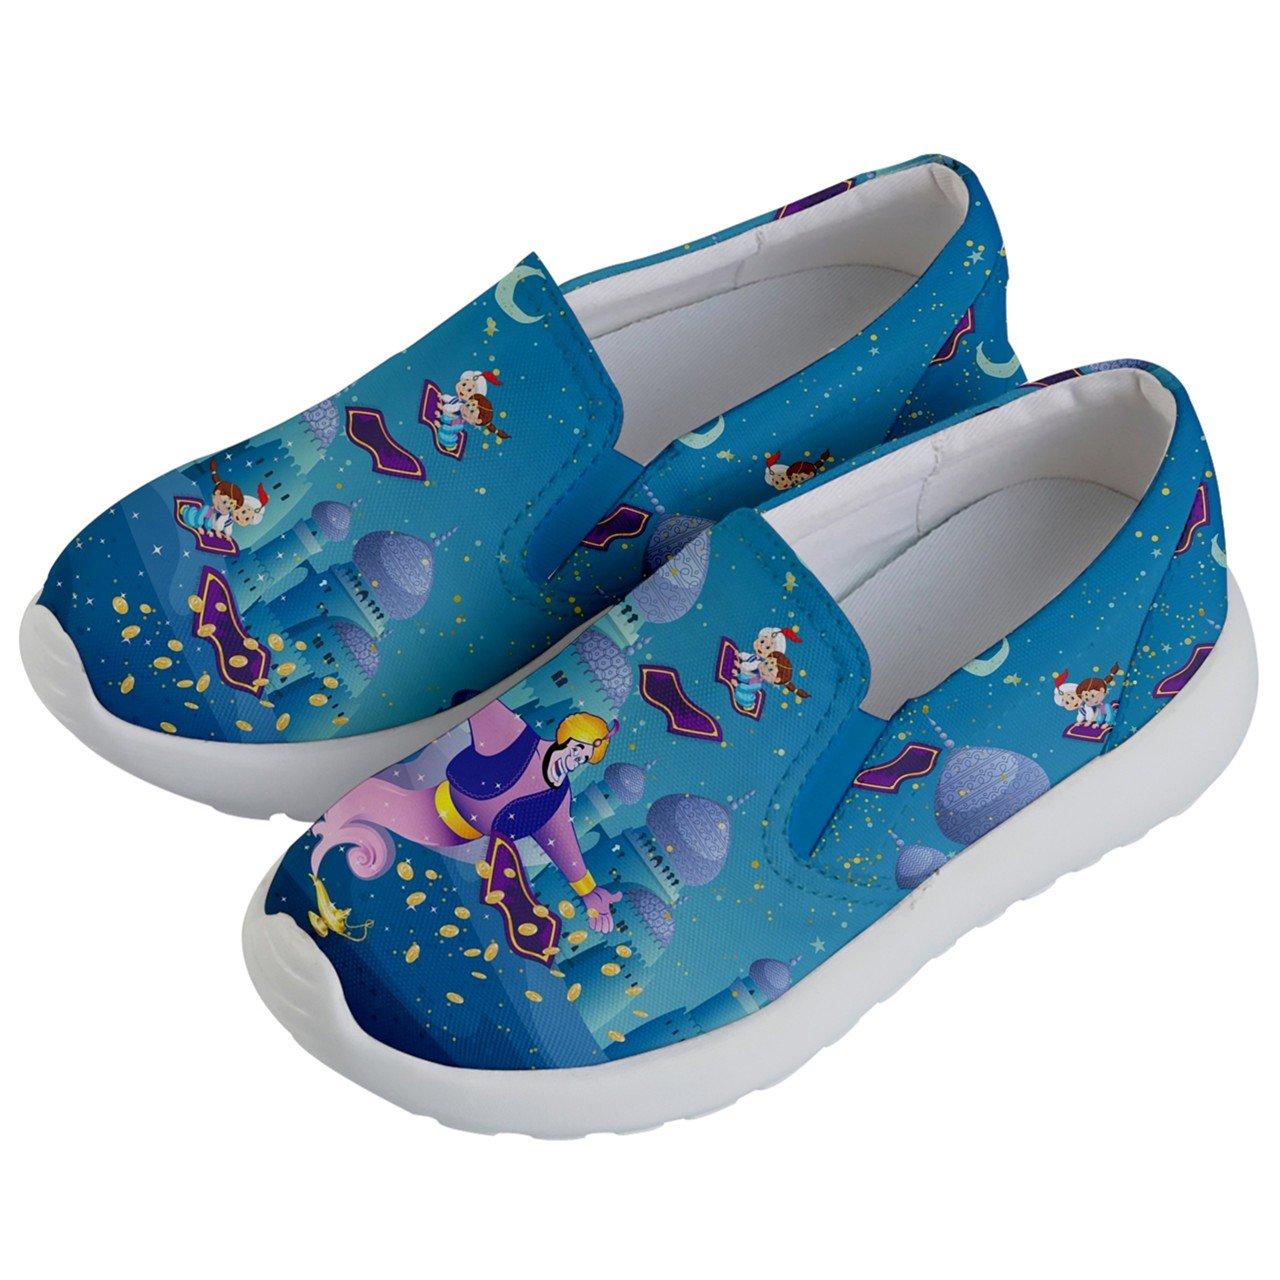 508b04aa Amazon.com: PattyCandy Unisex Shoes Woodland Elephant Chipmunk Clownfish  Fairies Cowboy Fairytale Cartoon Kids Lightweight Slip Ons: Clothing